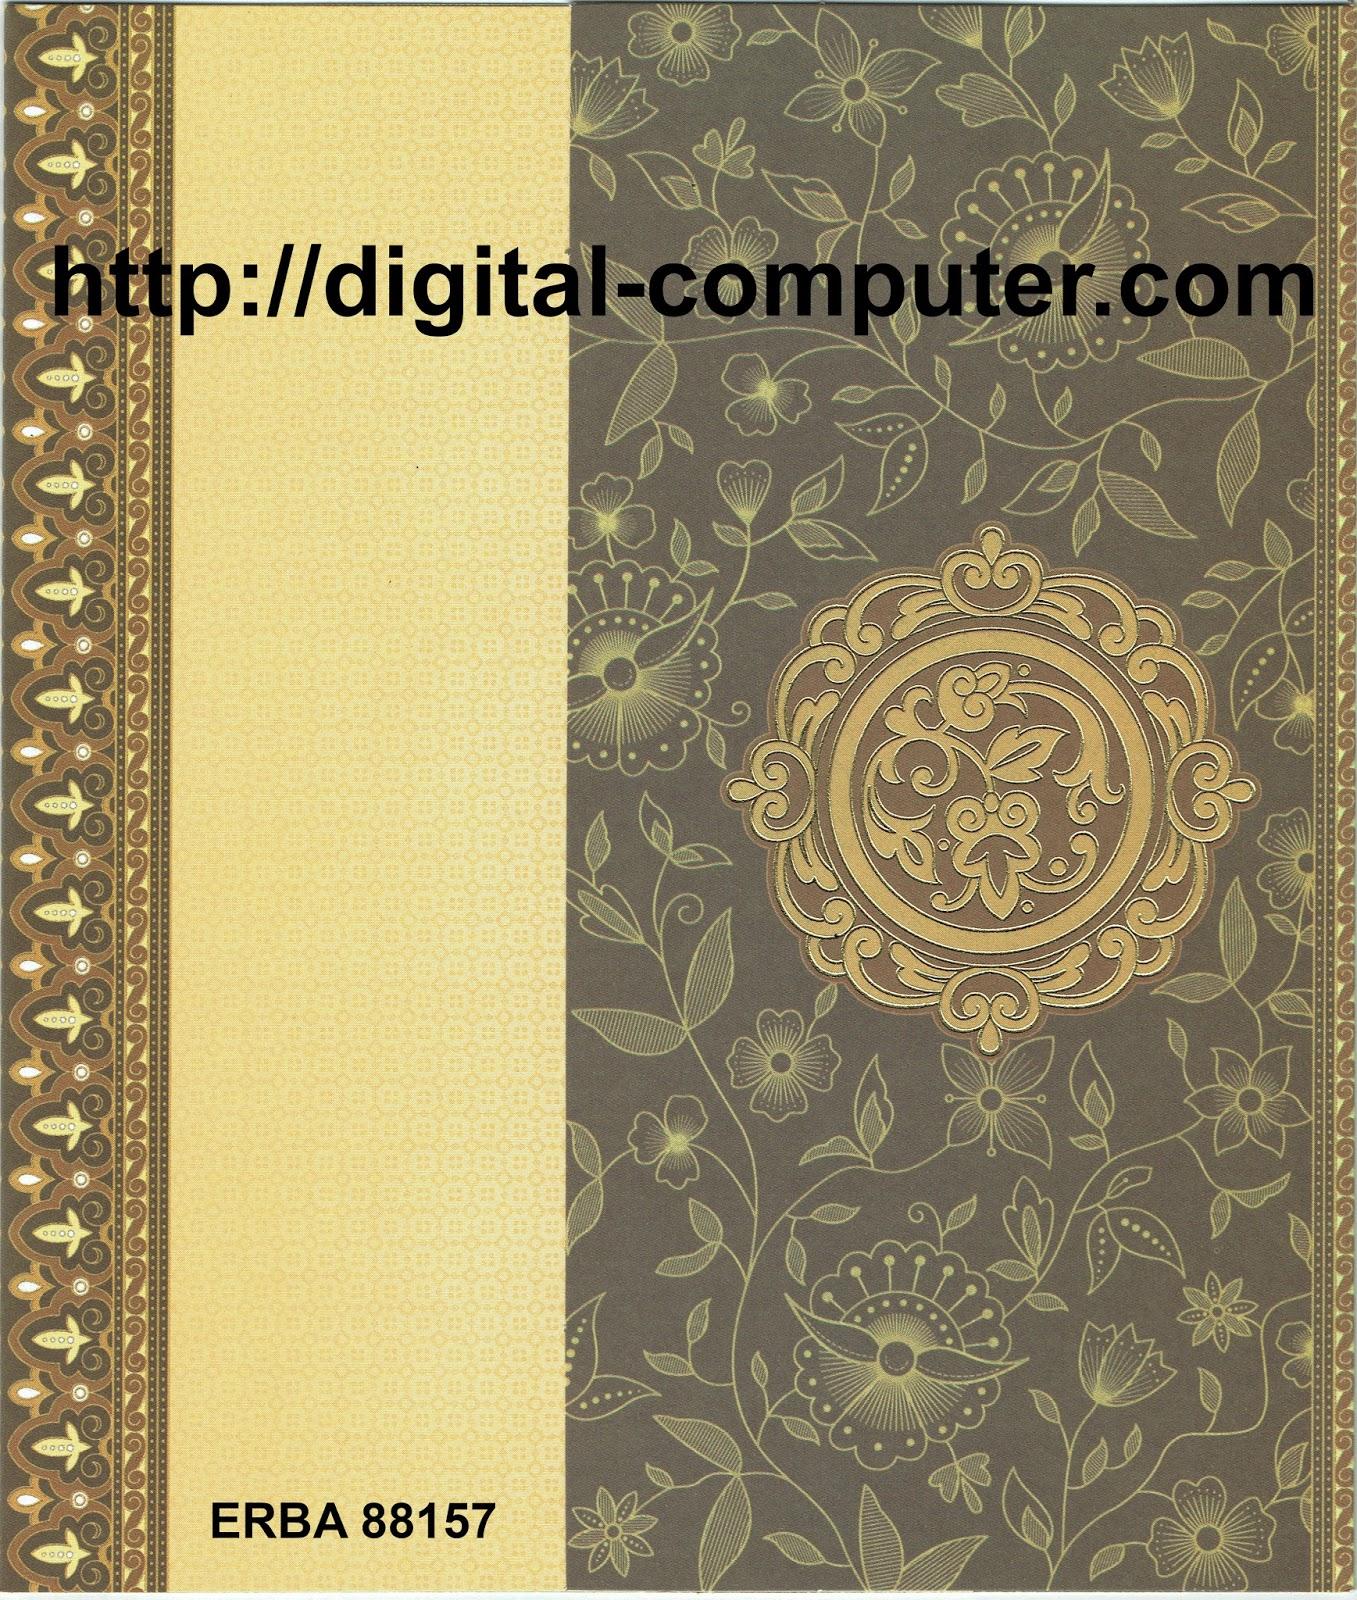 Undangan Softcover ERBA 88157